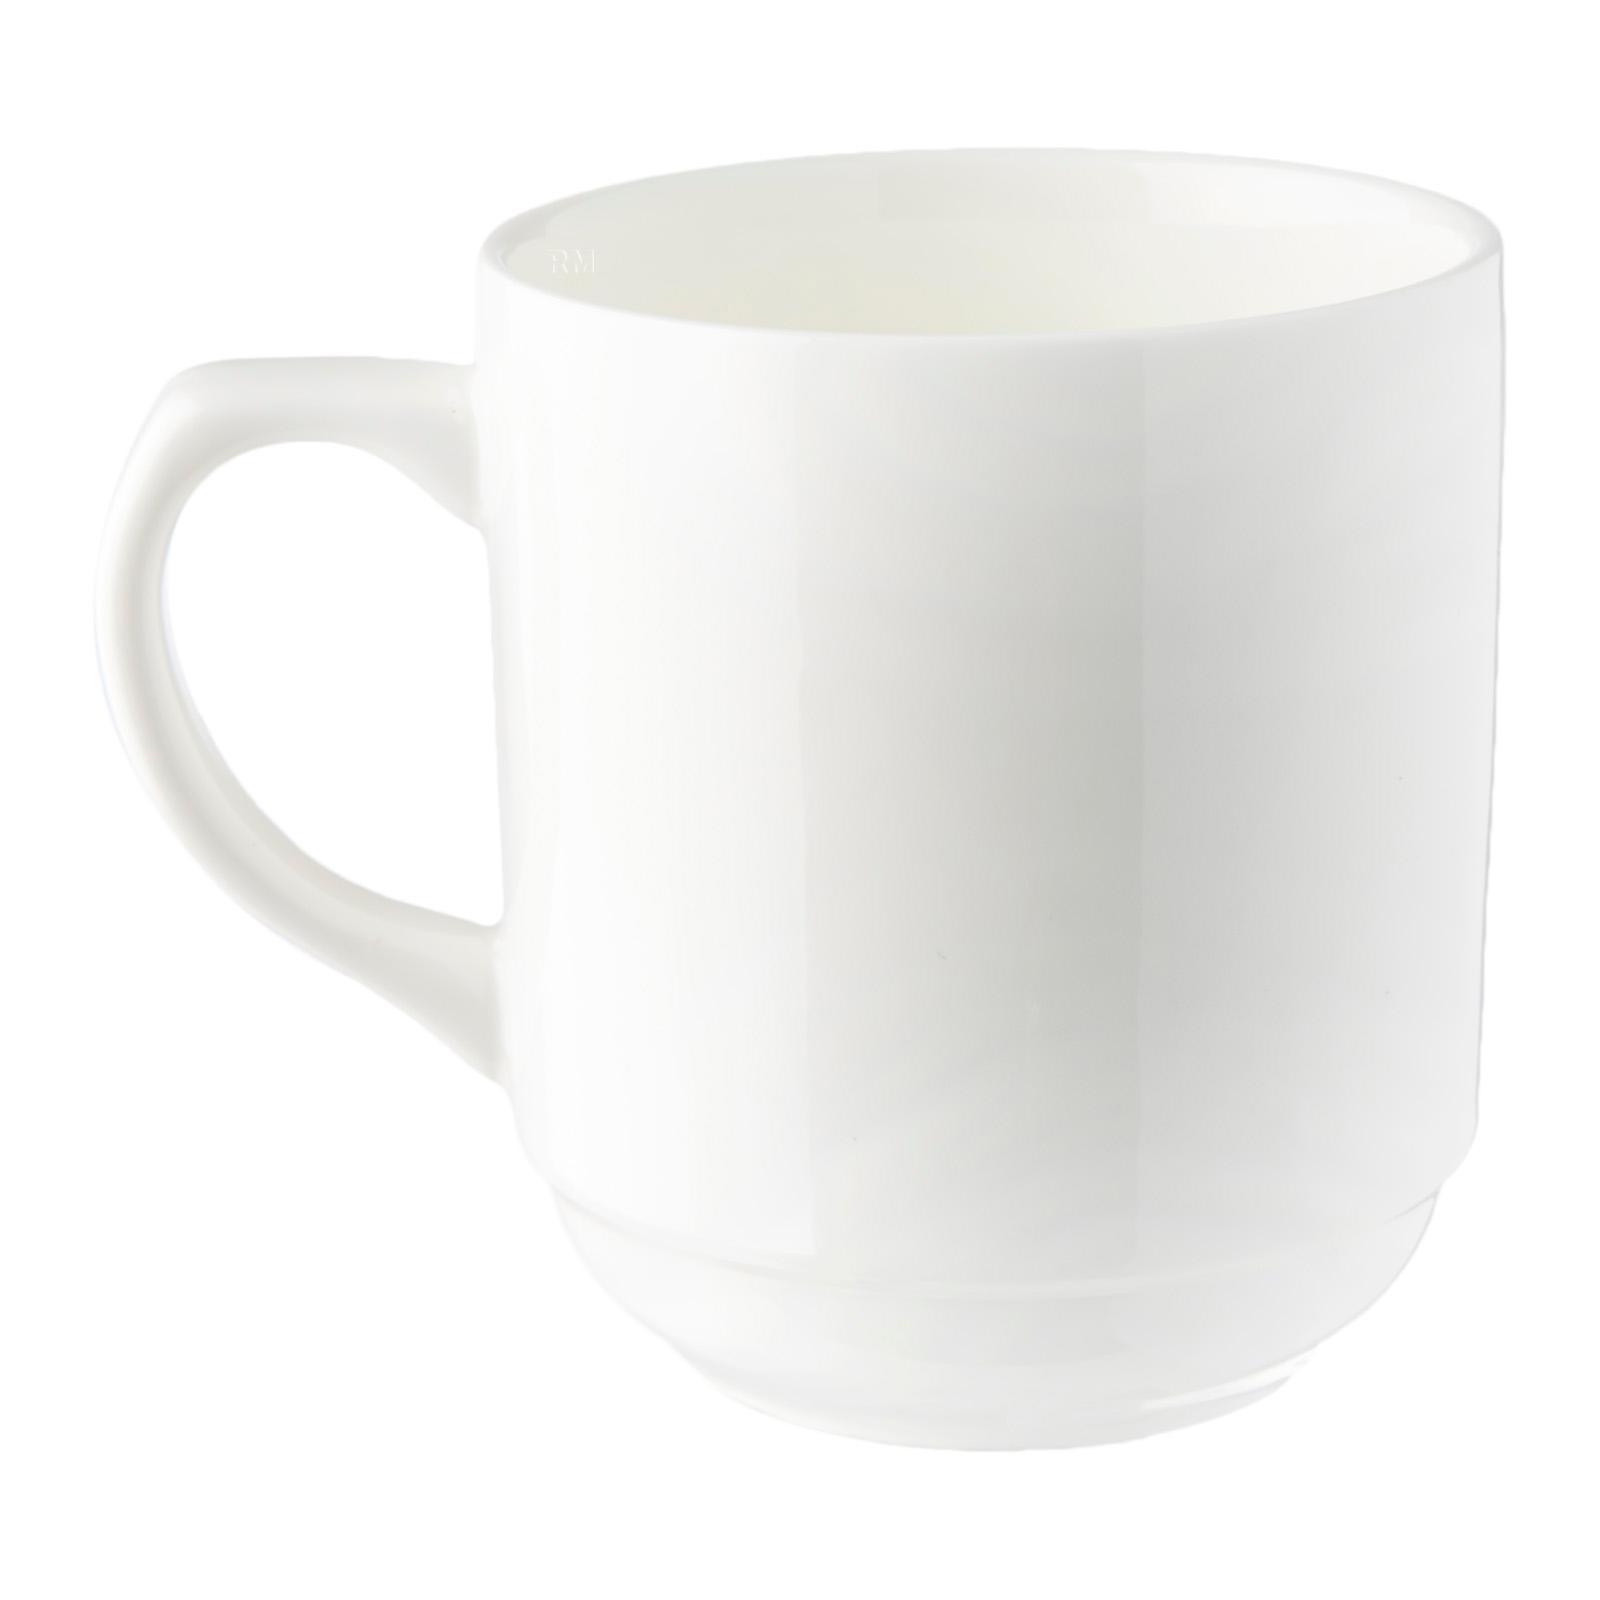 Wilmax England Porcelain Mug 320Ml